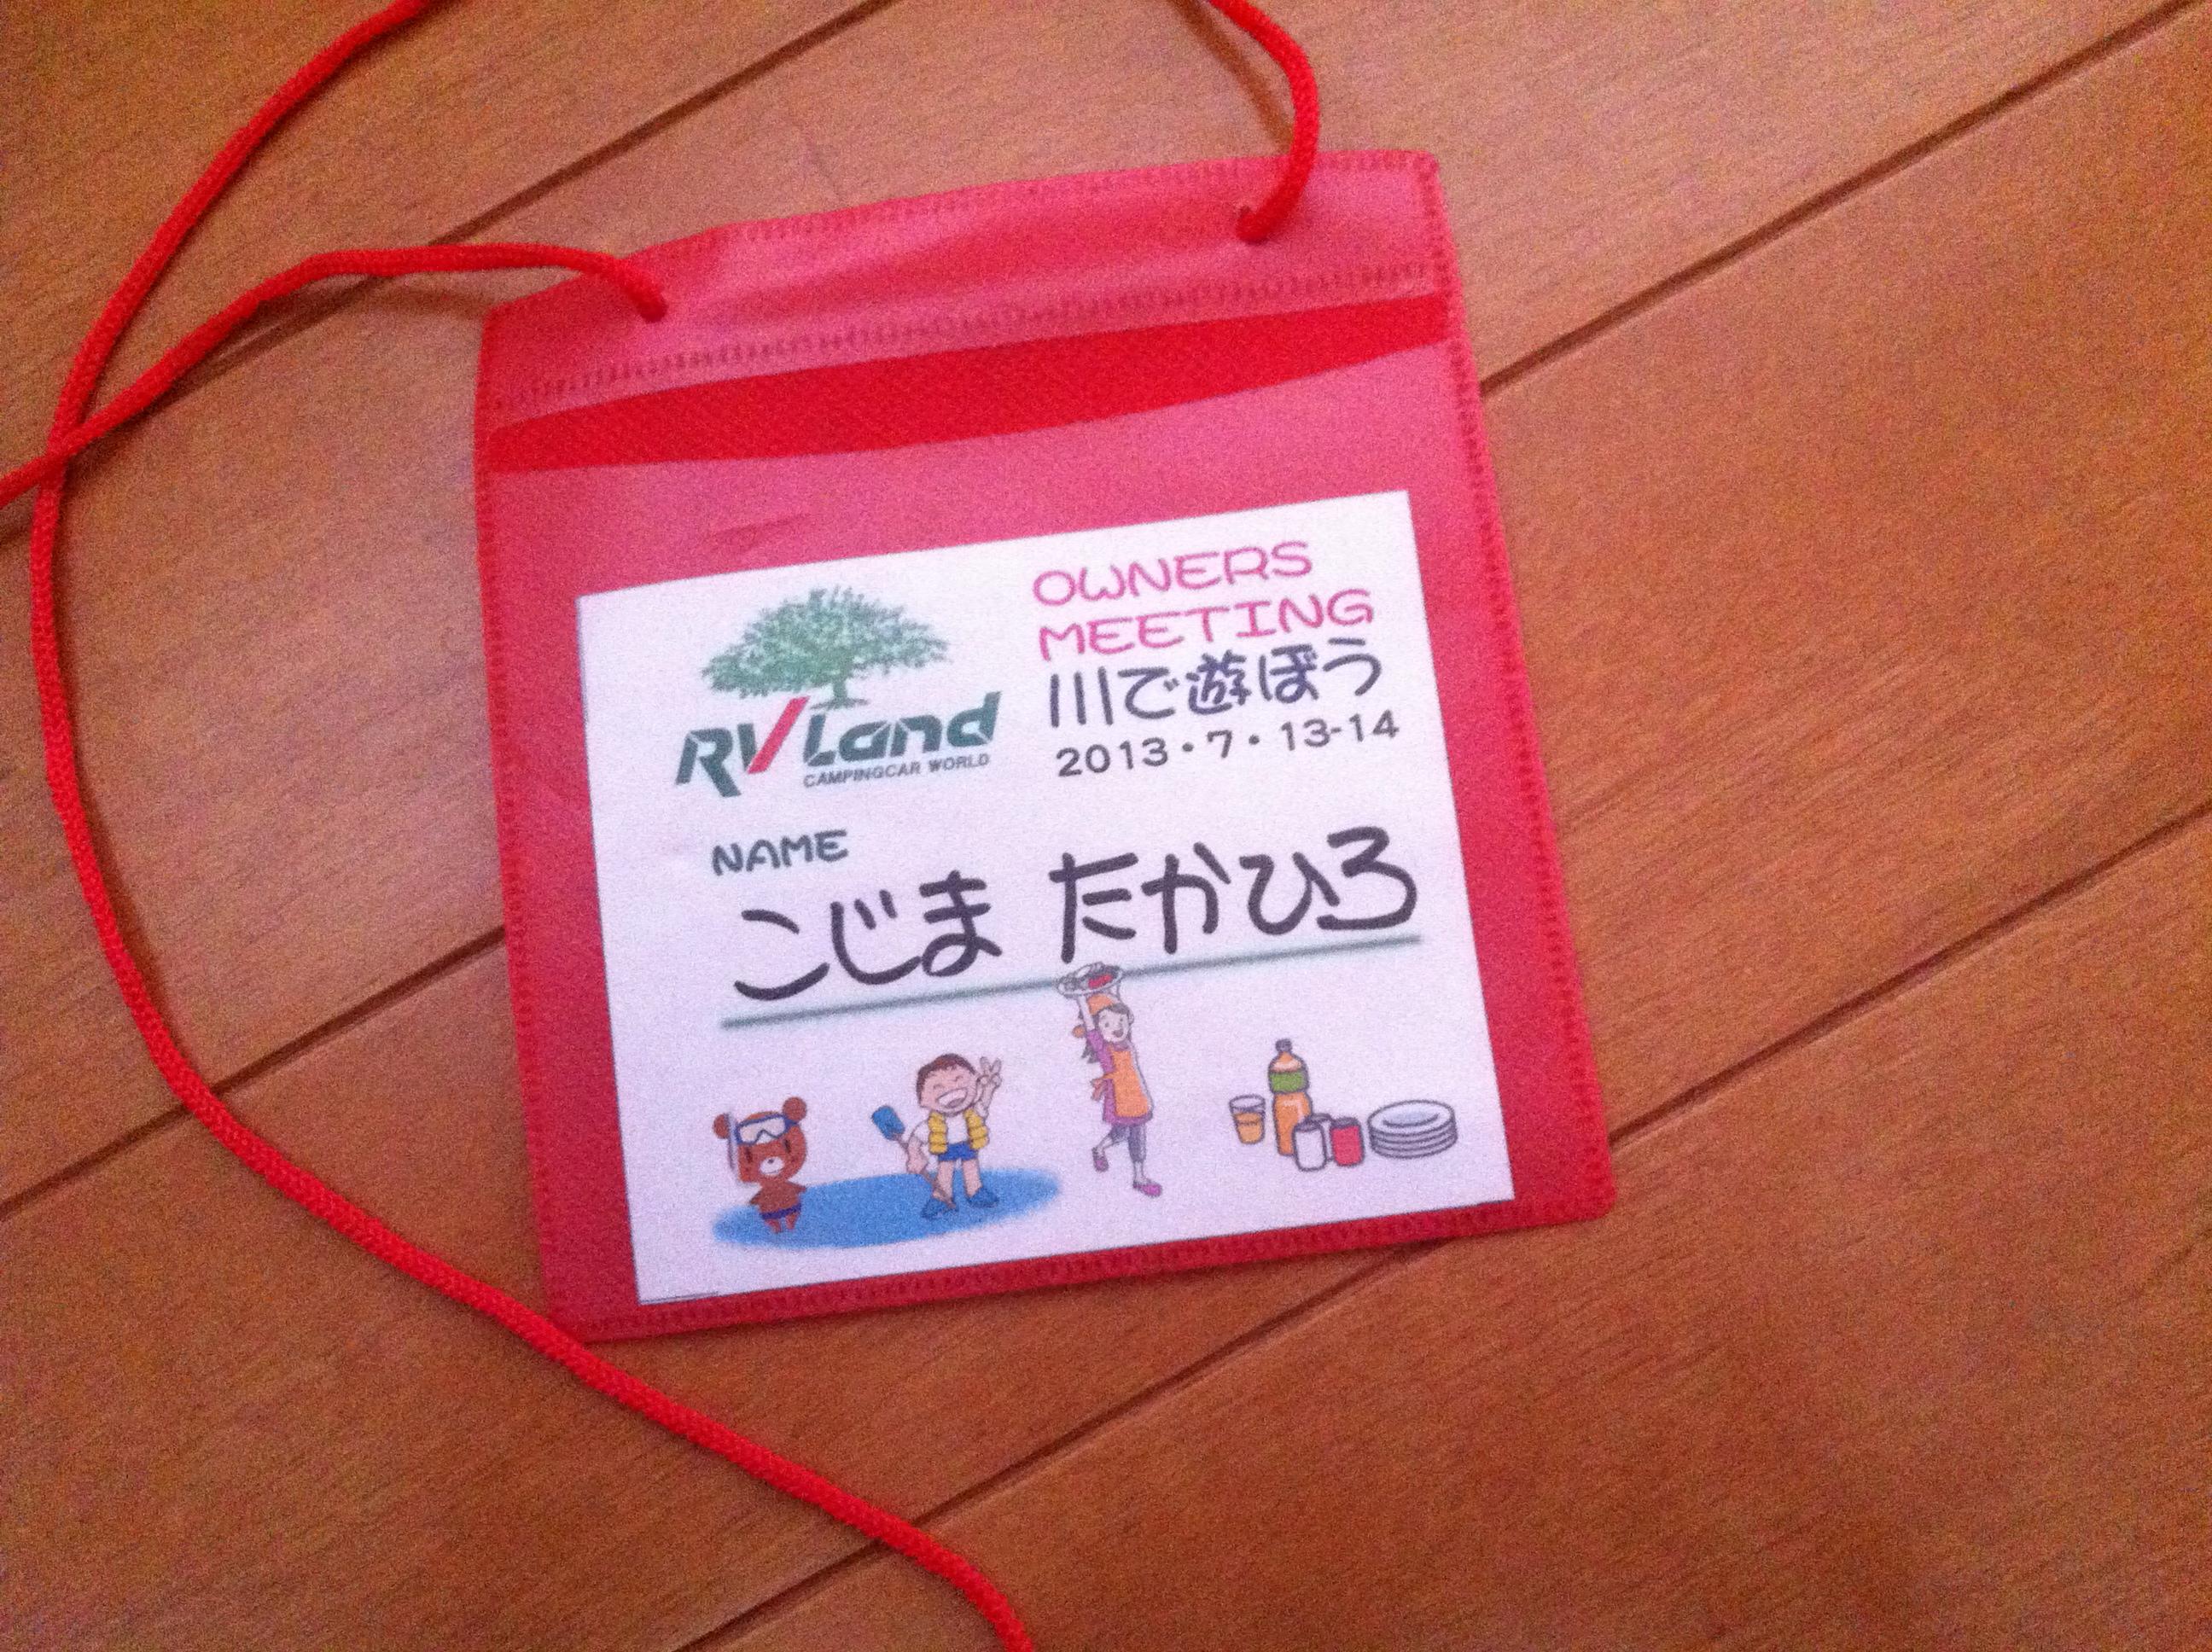 http://www.vantech.jp/shops/info/IMG_6337.jpg